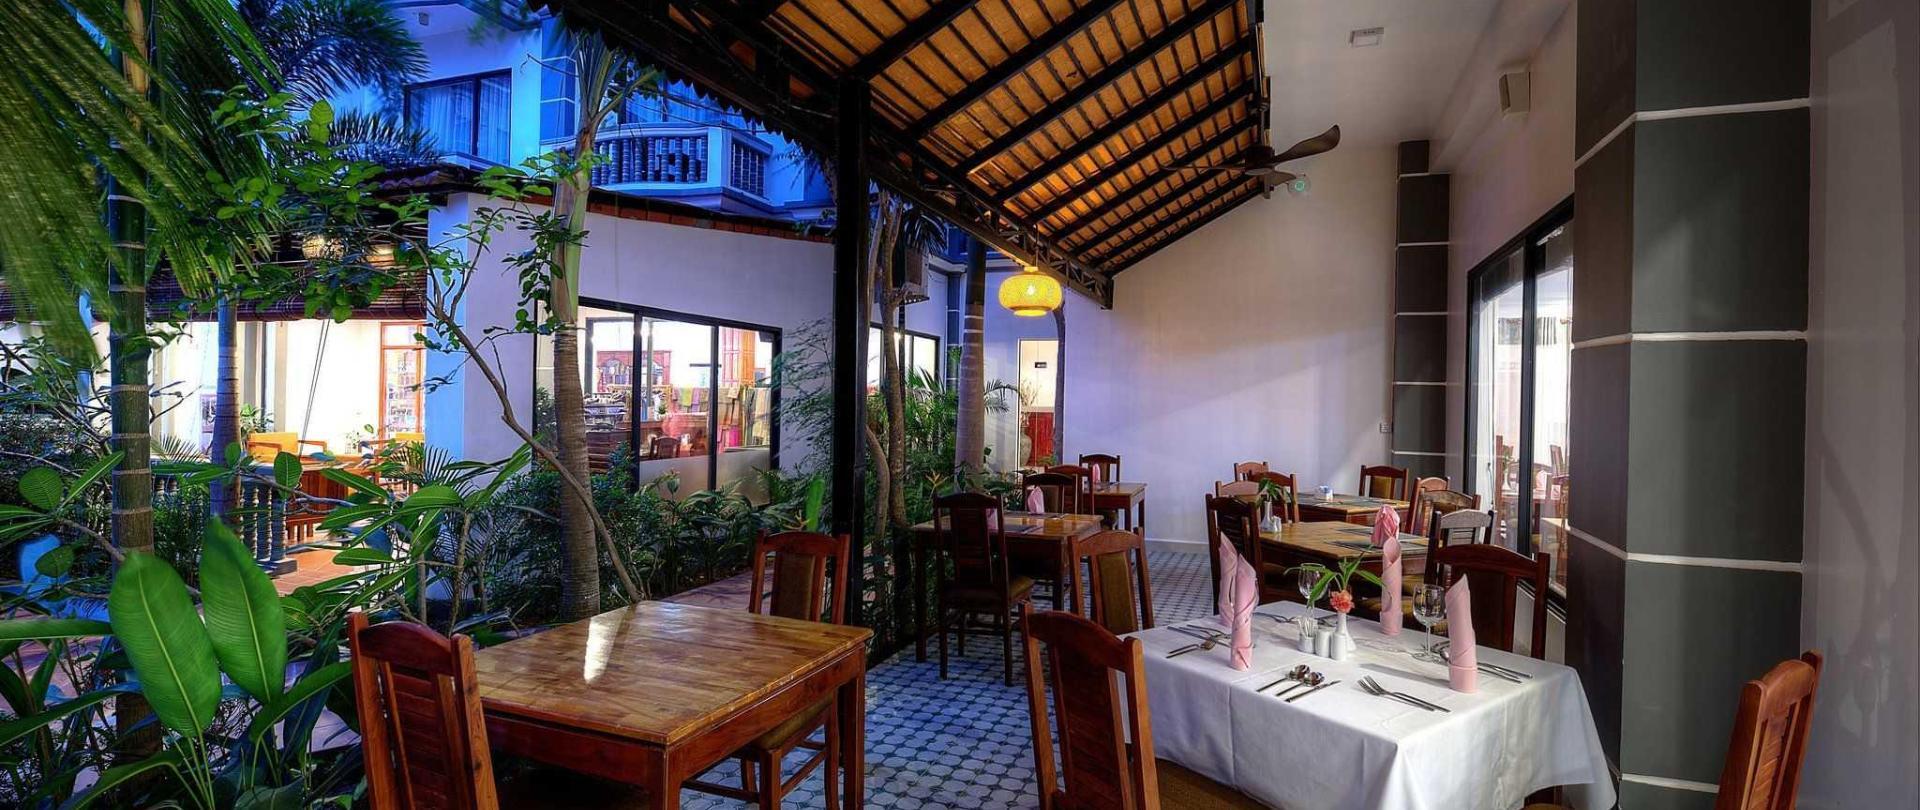 restaurant-catiyad.jpg